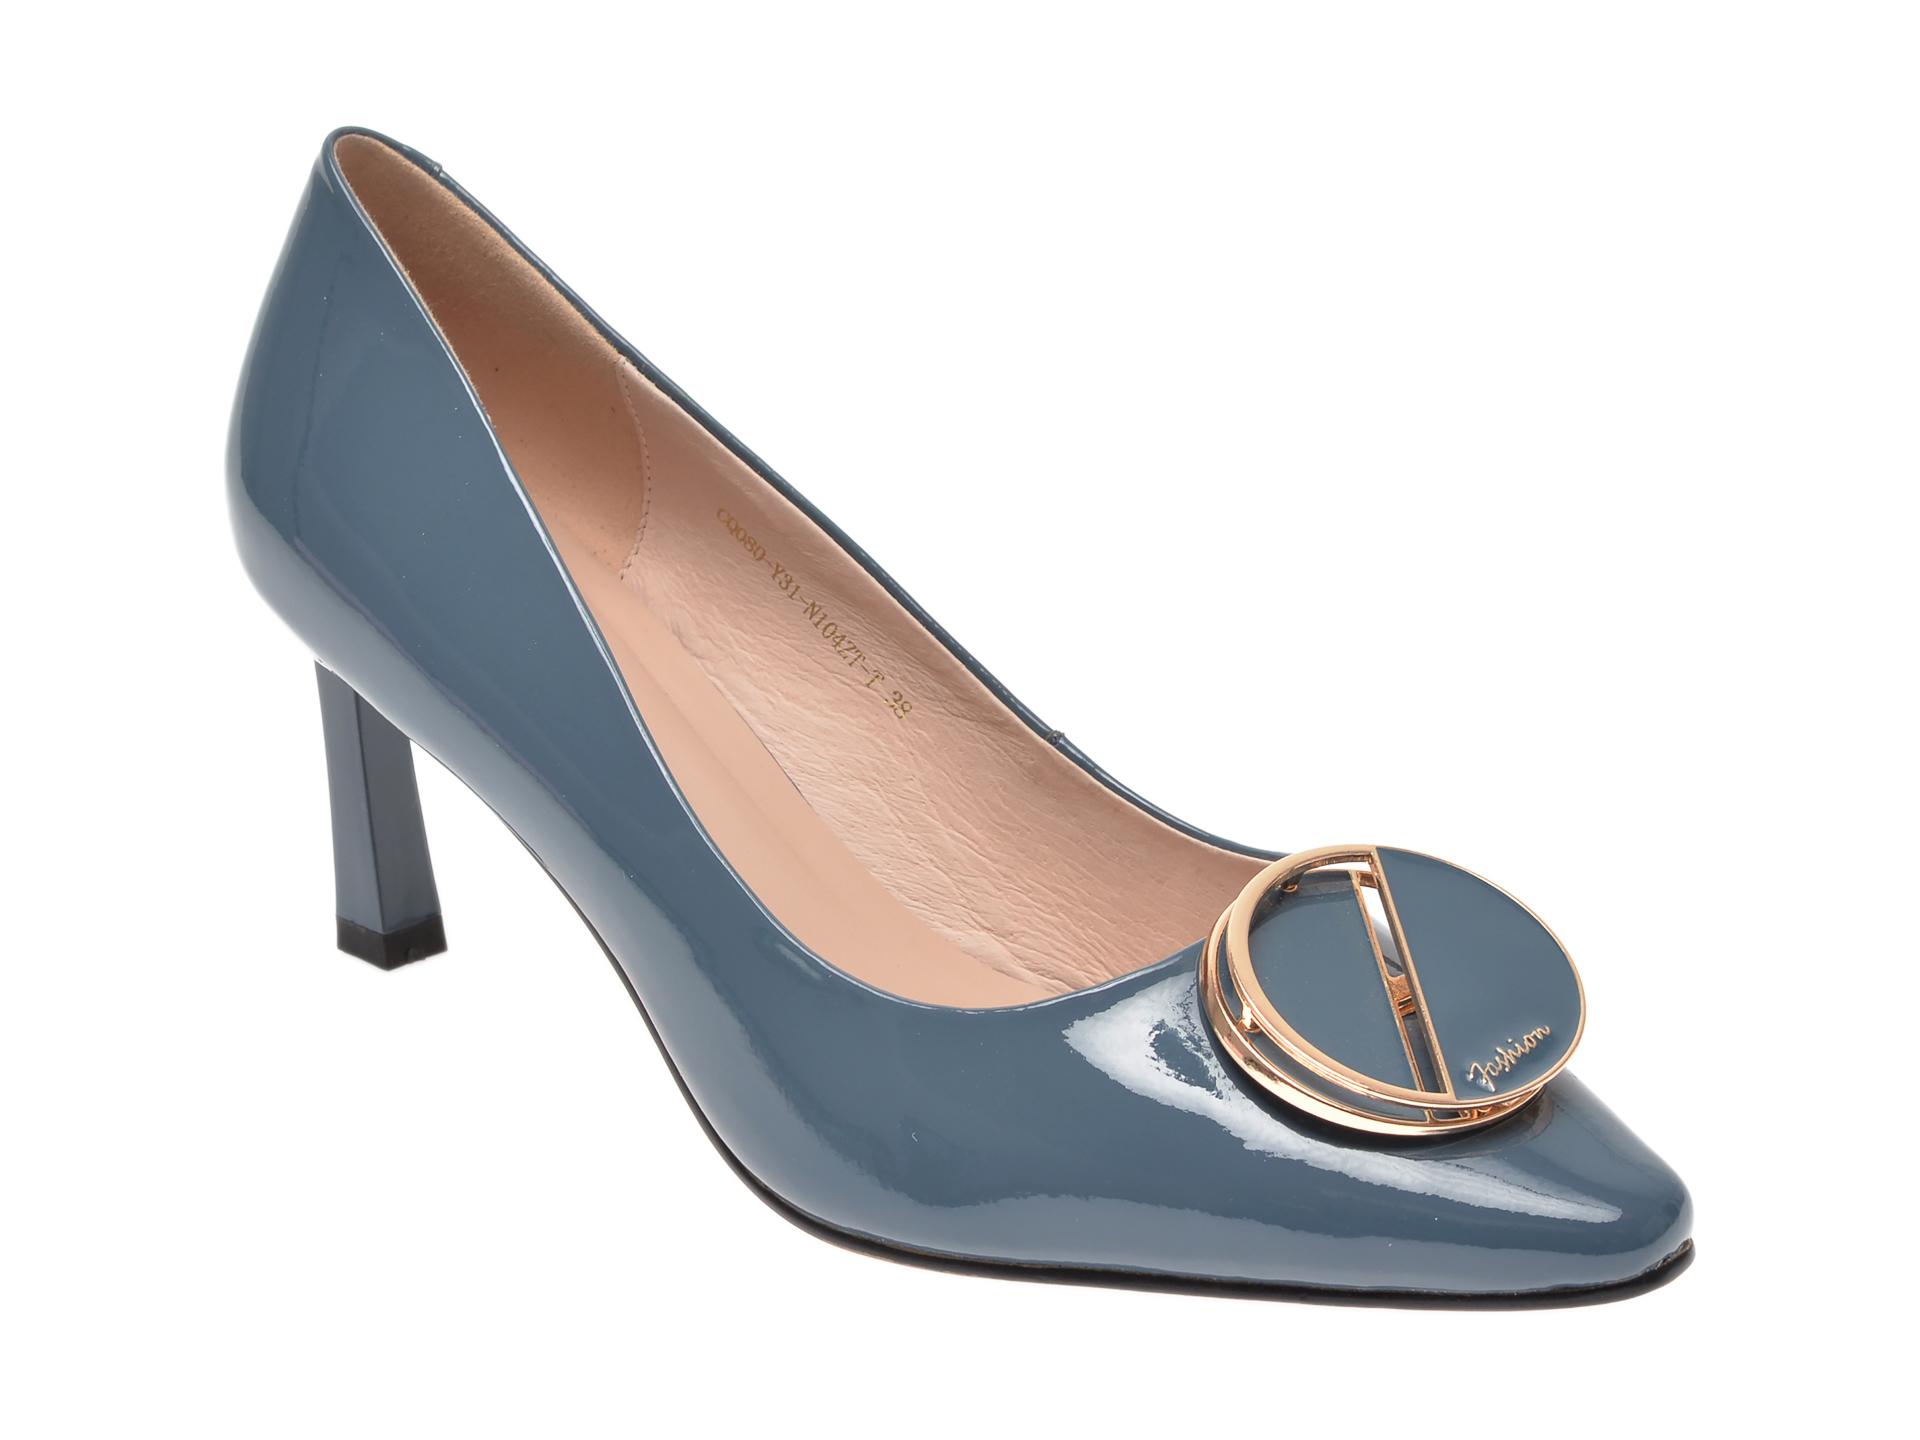 Pantofi EPICA albastri, CQ080Y3, din piele naturala lacuita